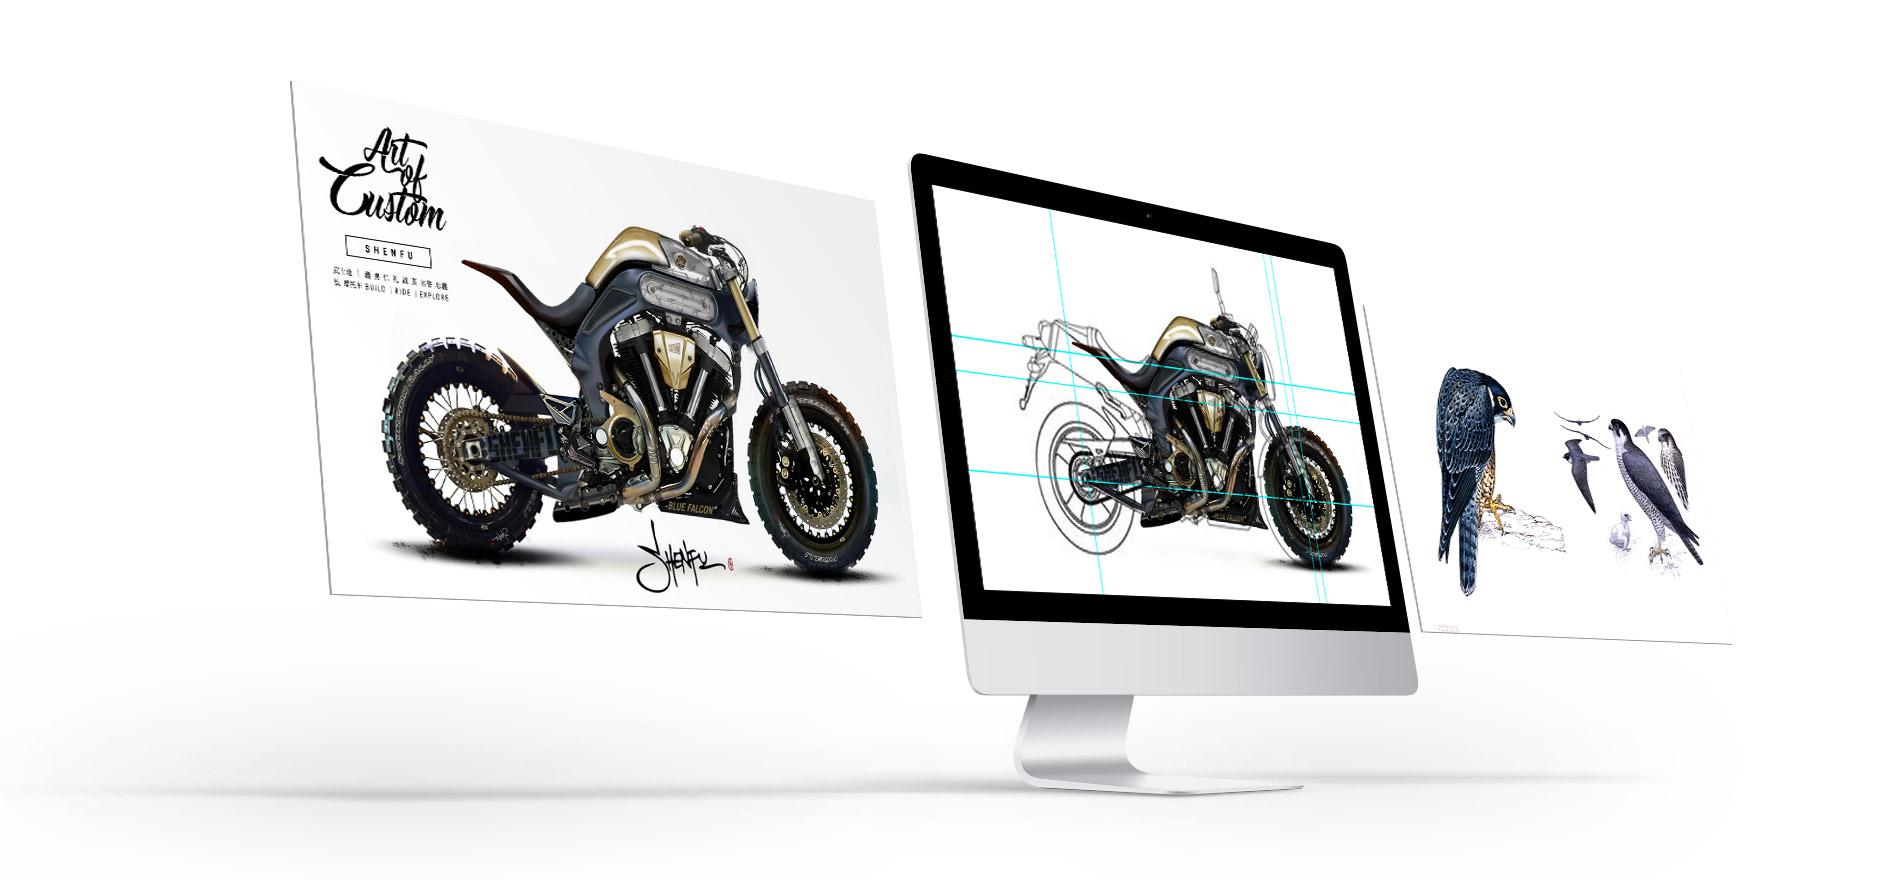 Titan_CustomBikes_CafeRacer_Austria-Atelier_SHENFU_Concept_Idea_Illustration_Digital_Artwork_Motorycle-Drawing-Artwork Motorrad BMW Umbau Graz